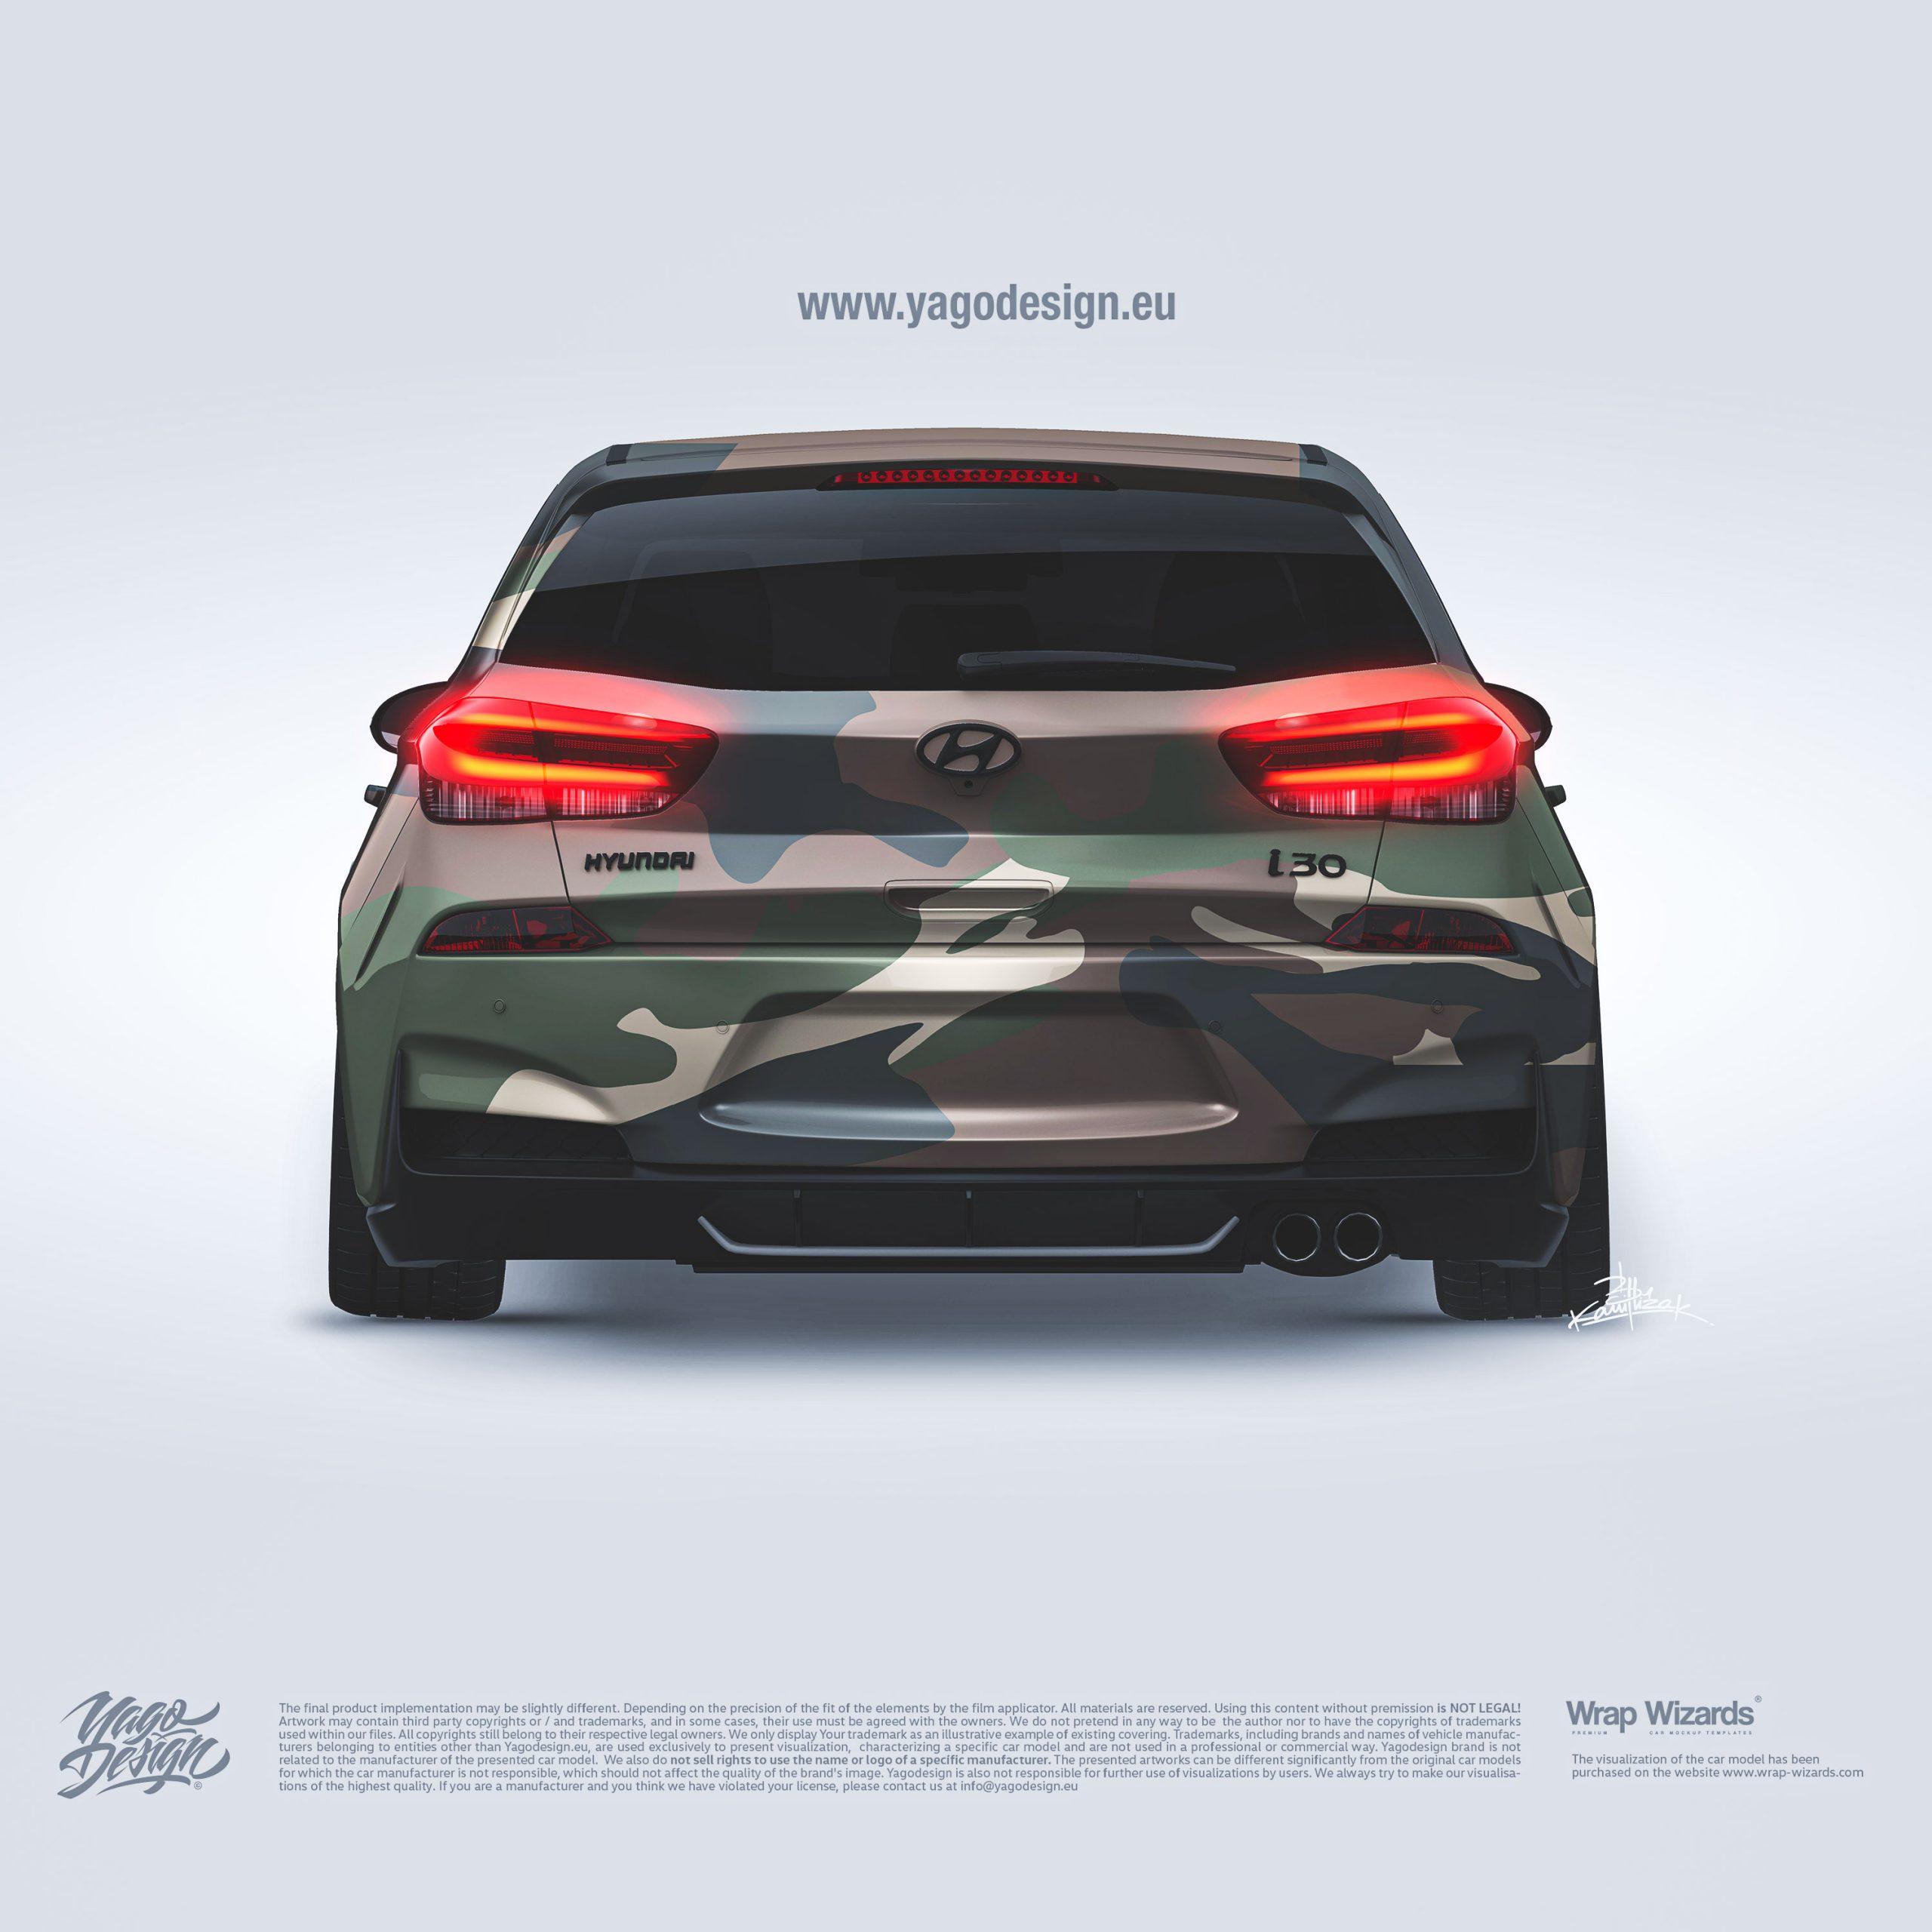 Hyundai-I30N-performance-by-Yagodesign-RV